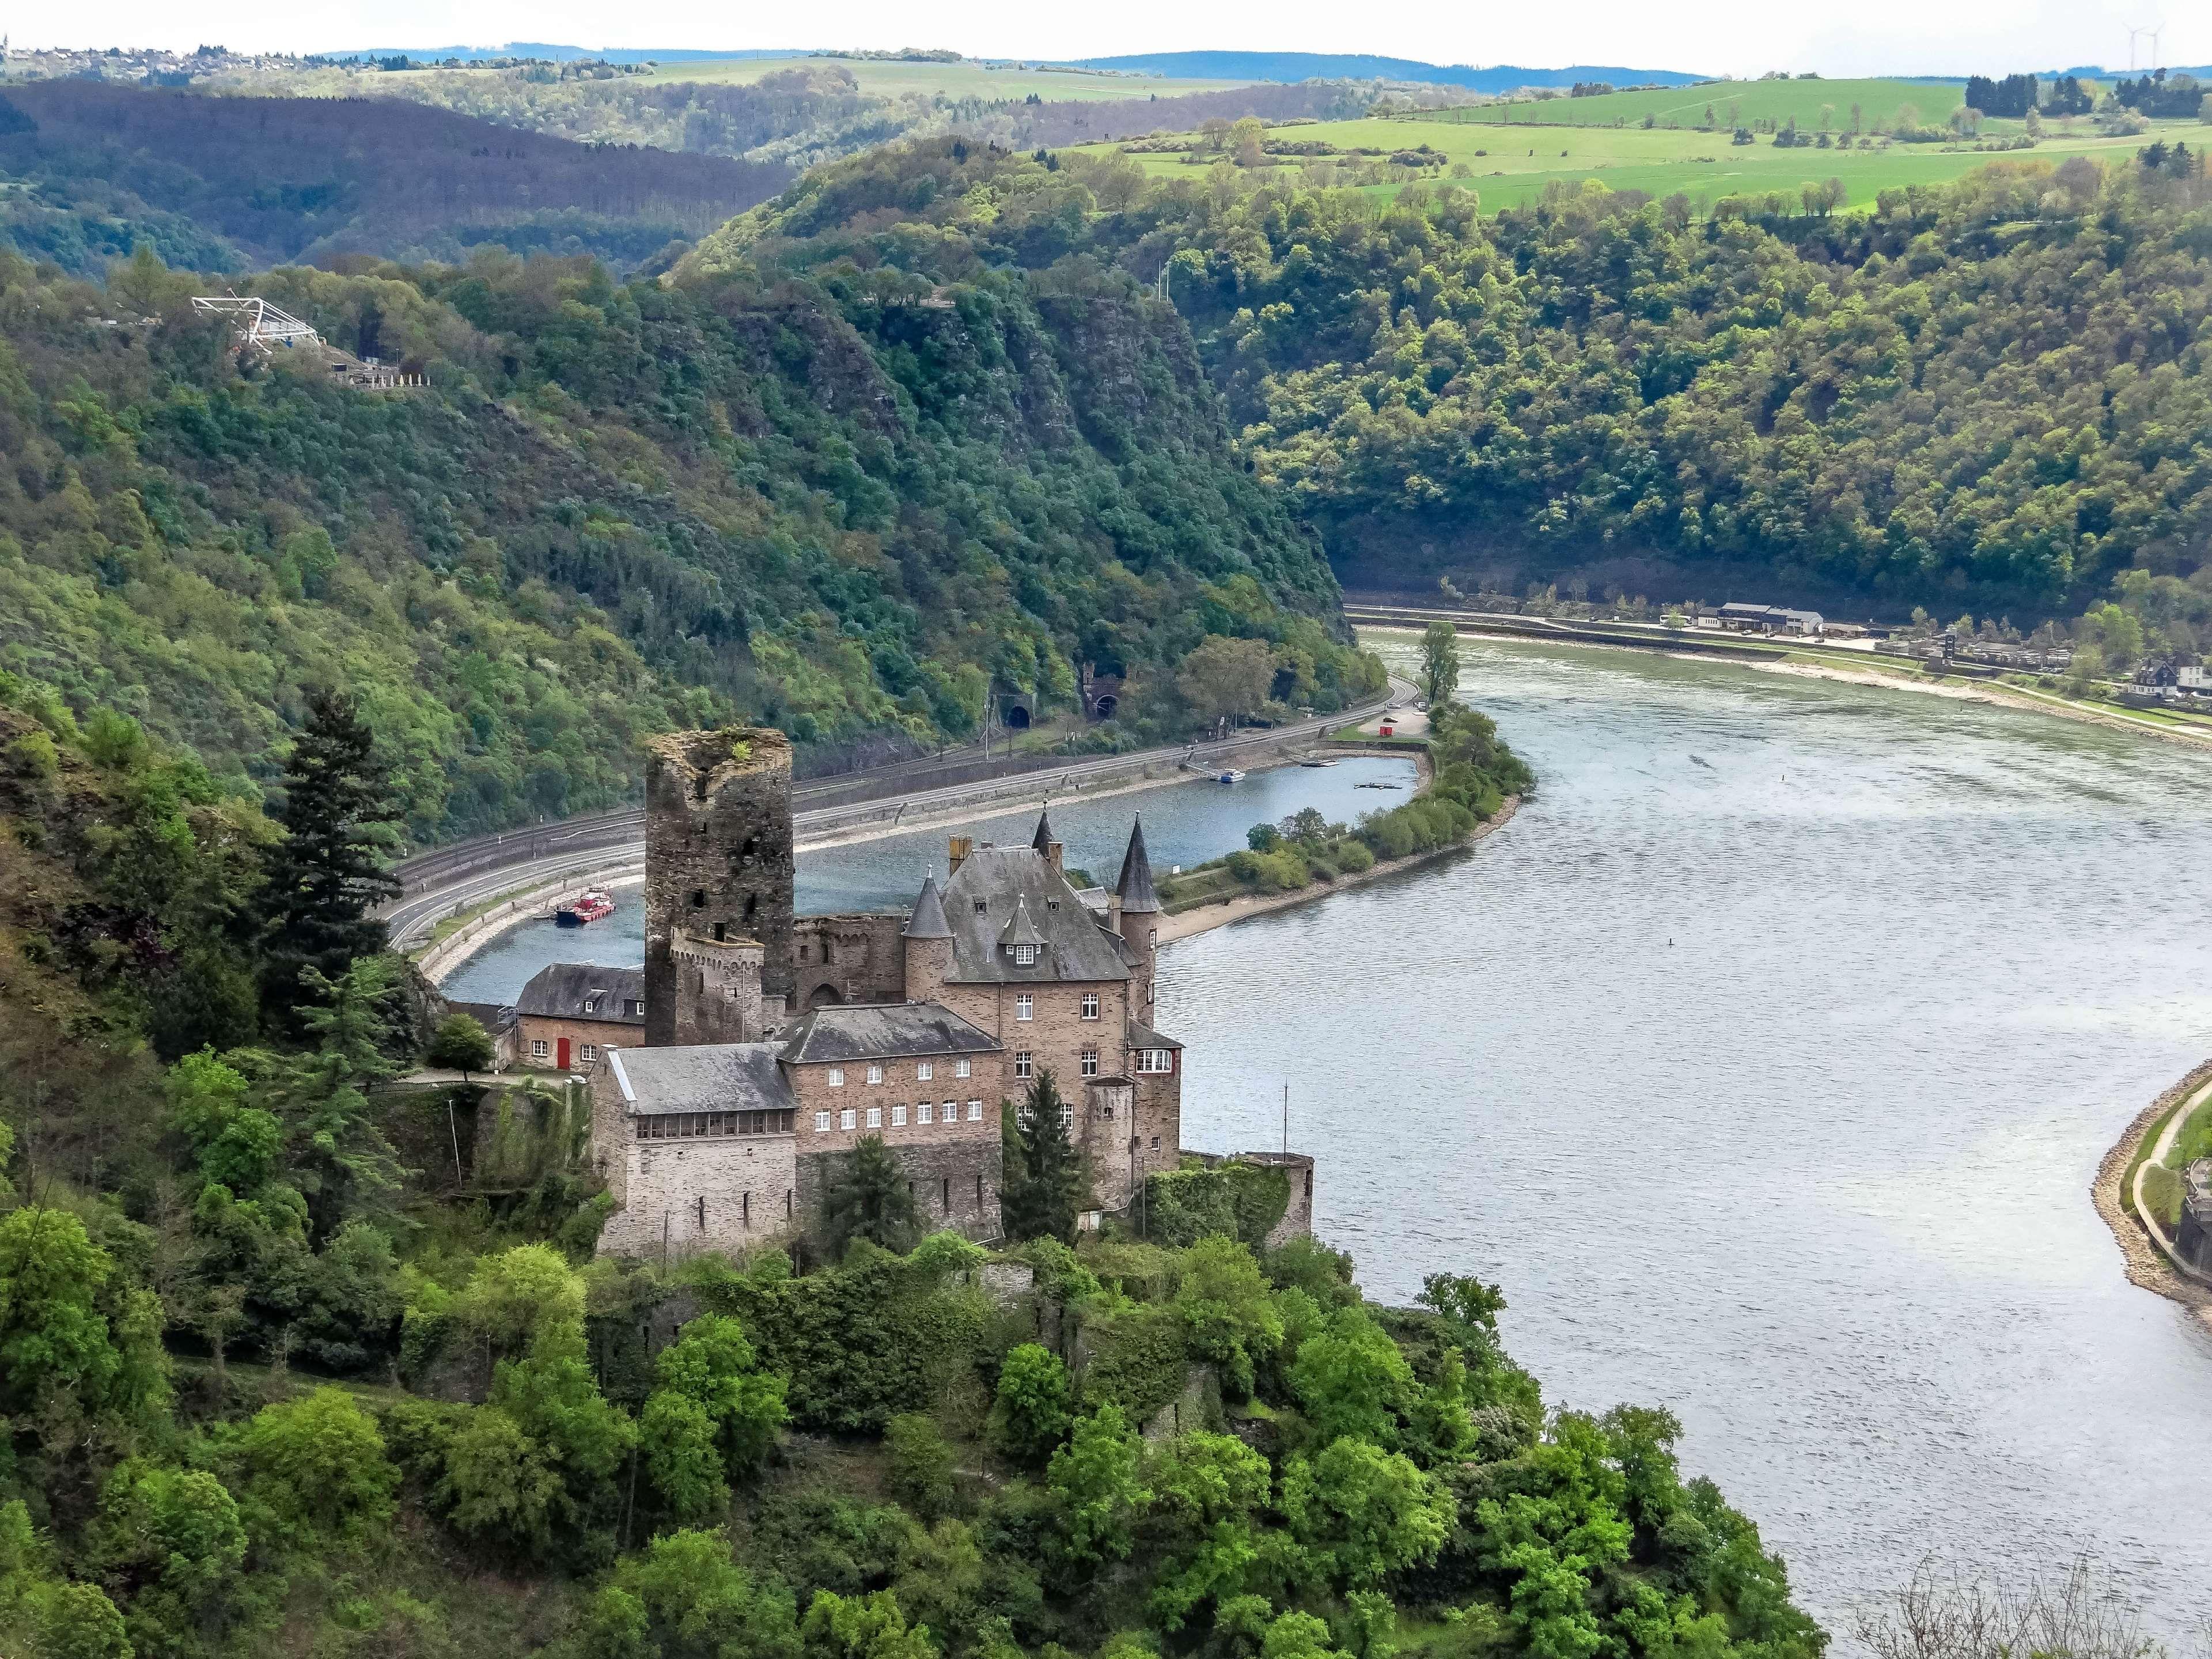 #burg katz #castle #current #germany #loreley #medium rheinthal #middle ages #middle rhine #outlook #rhine #sachsen #st goar